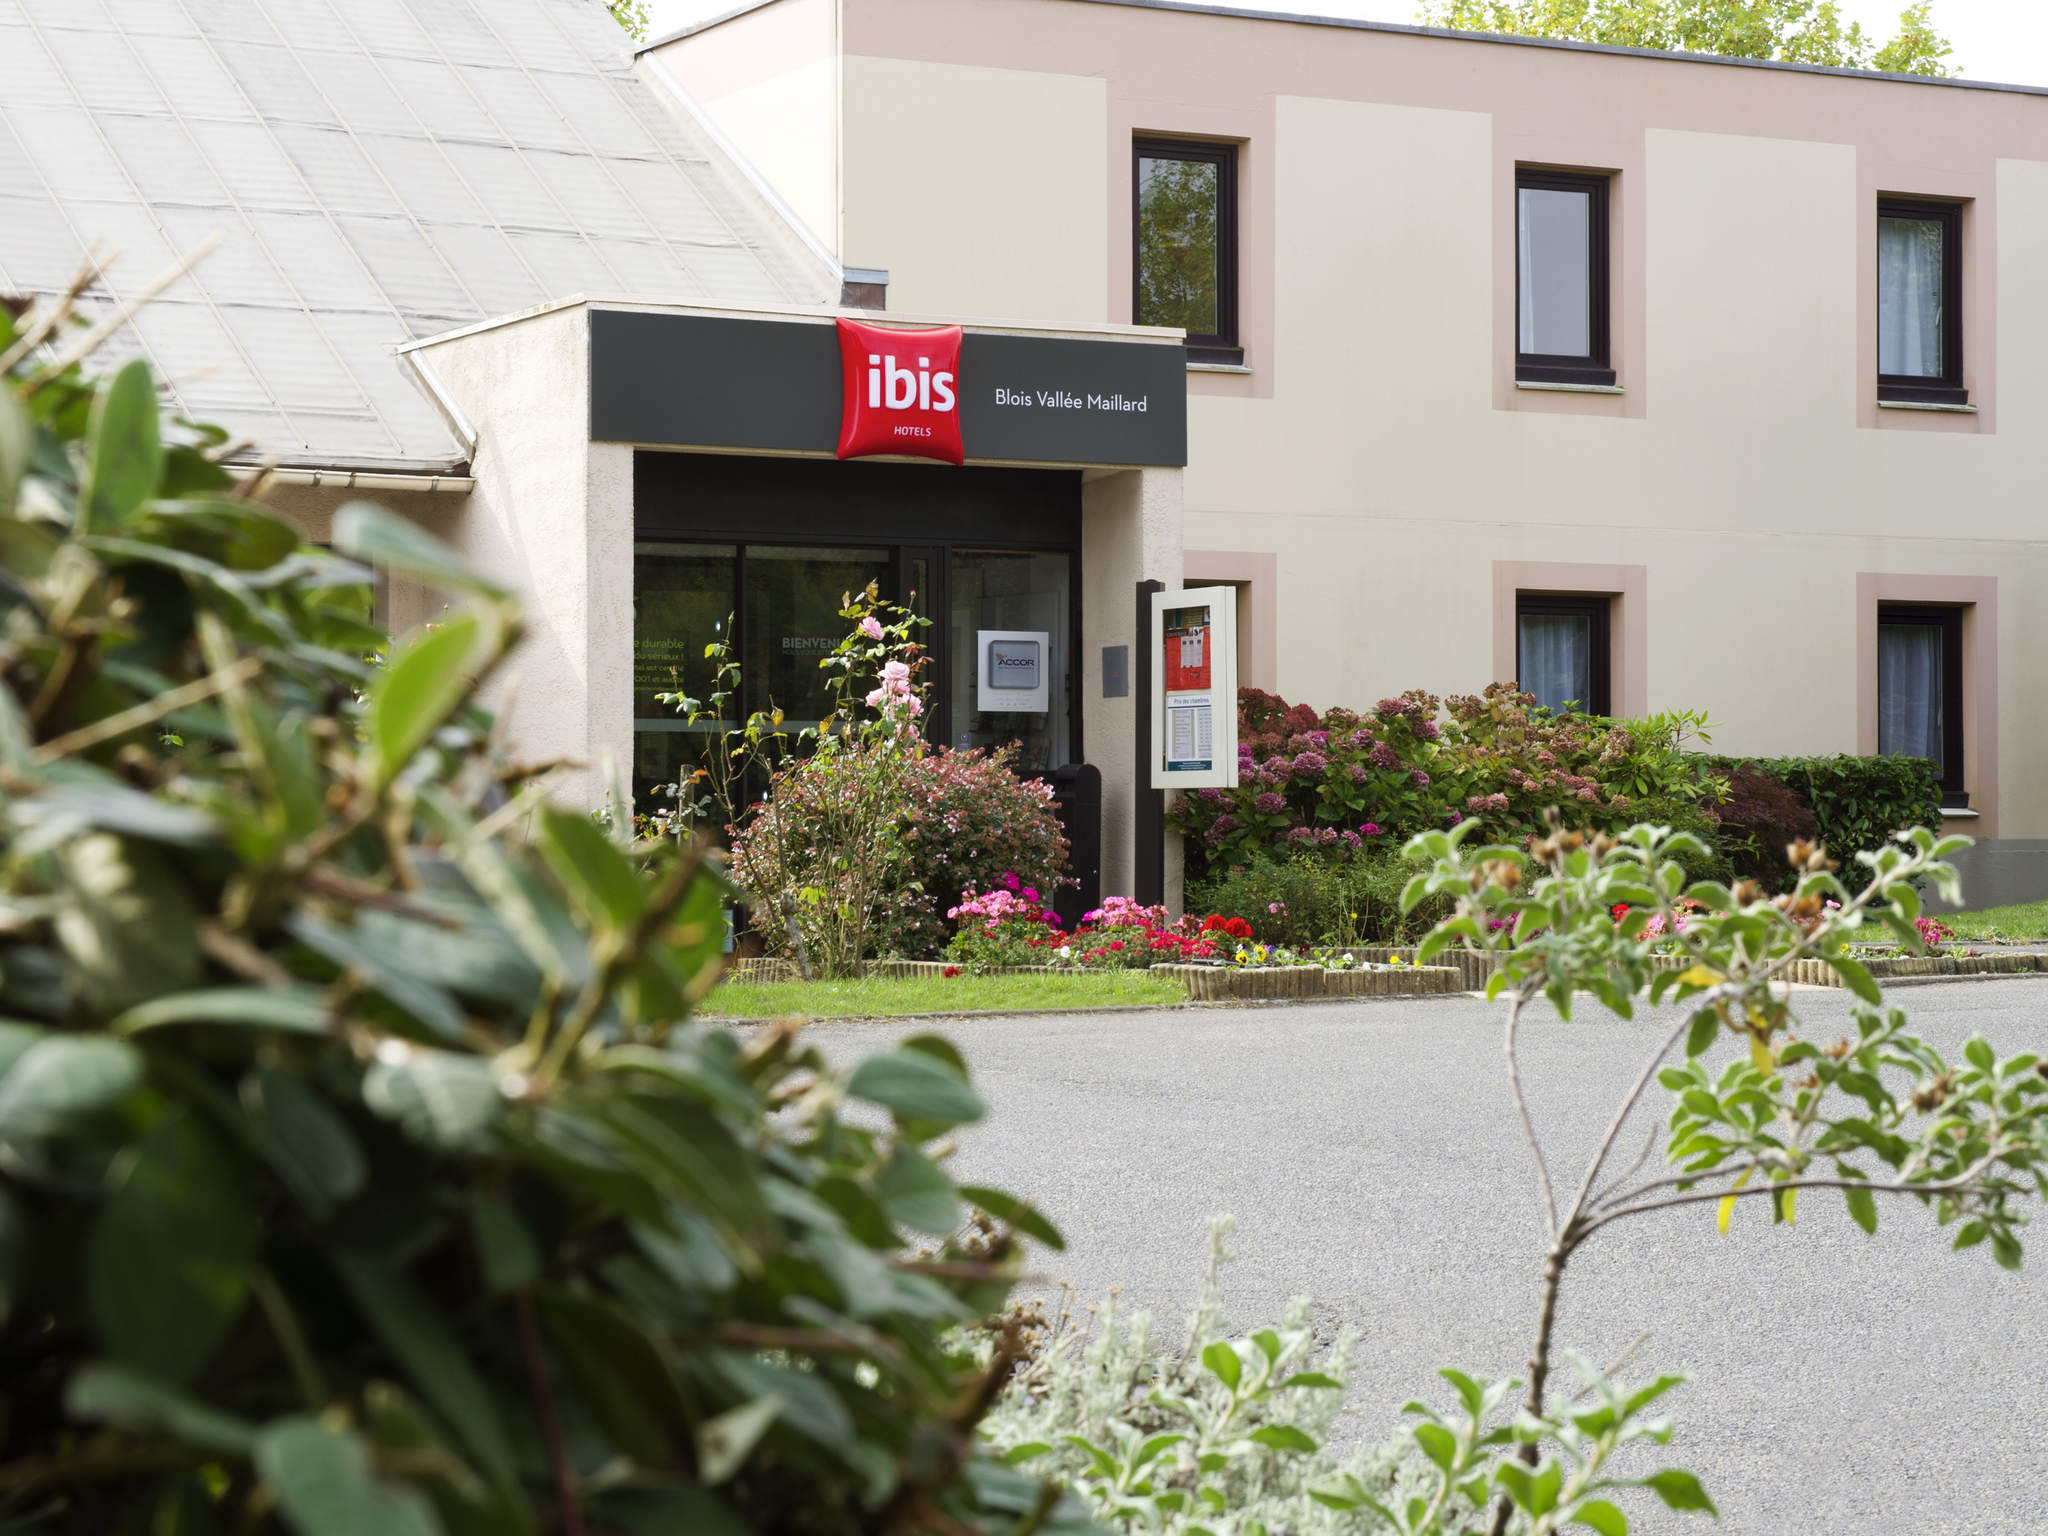 فندق - ibis Blois Vallée Maillard